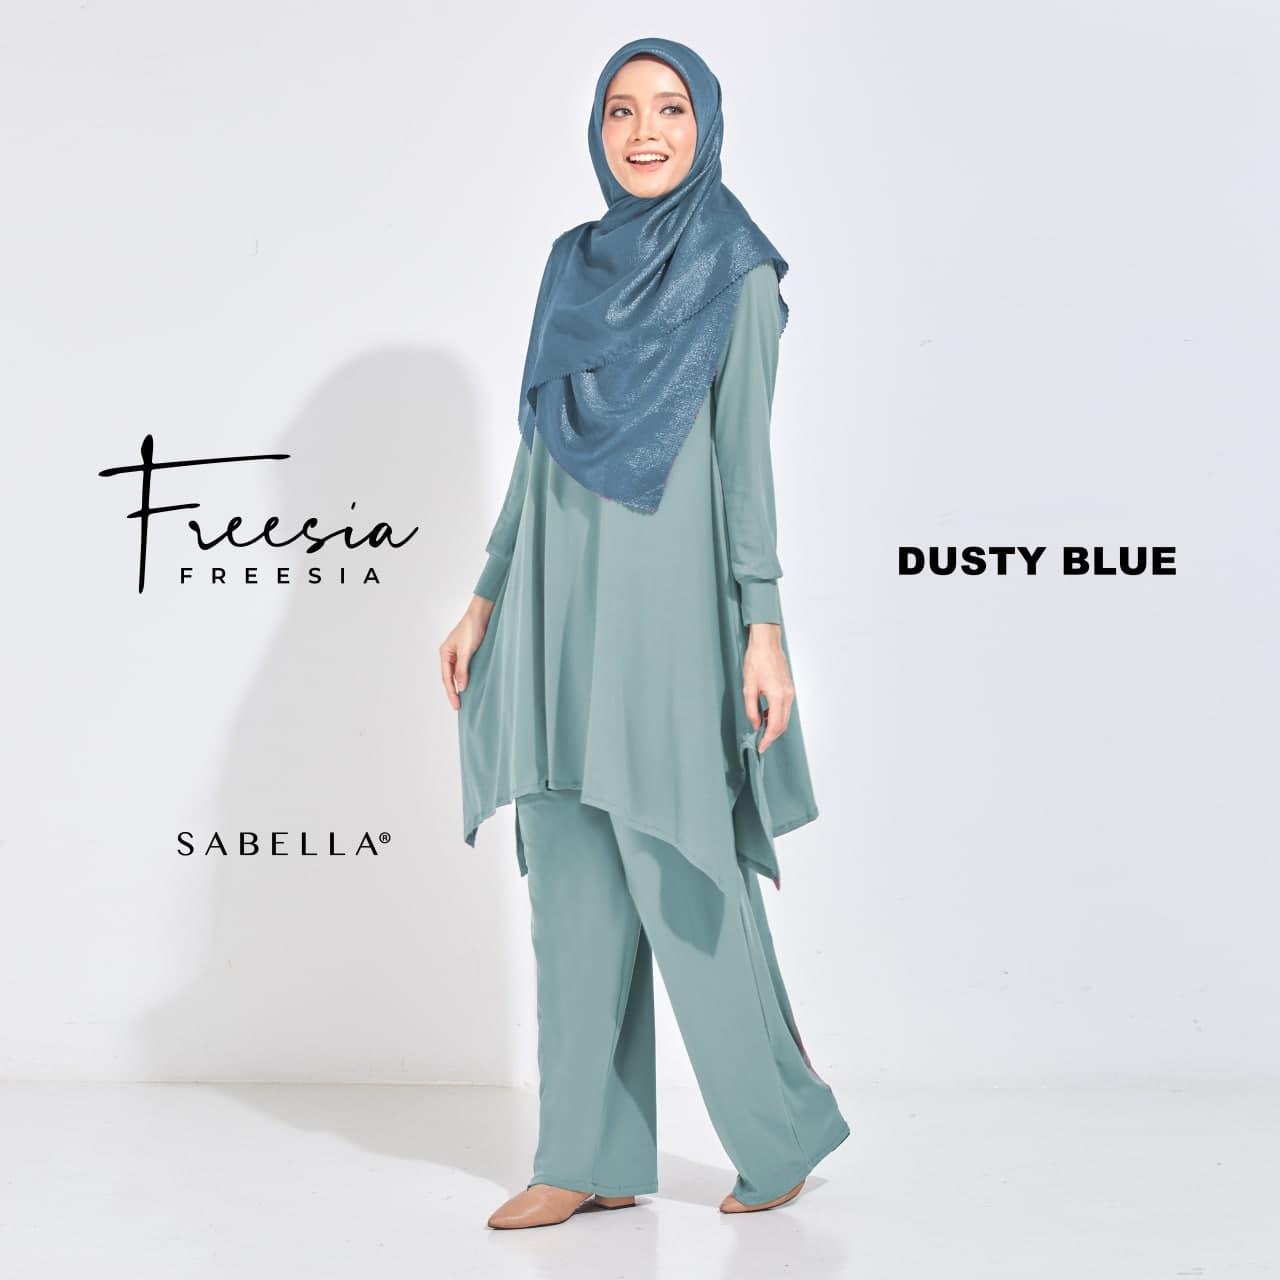 Freesia Dusty Blue